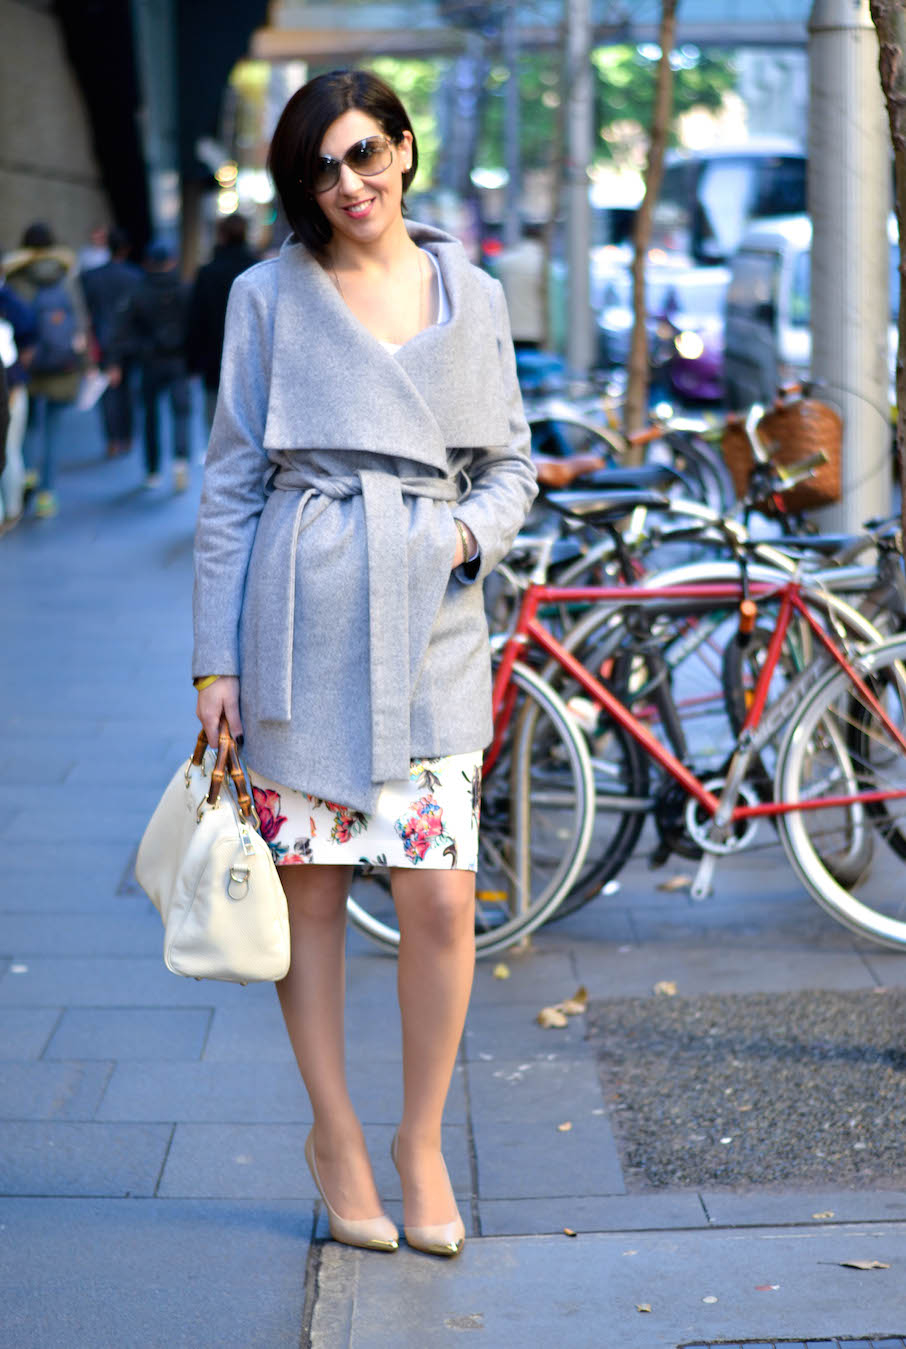 "NSW: Joanne Guidaci, events co-ordinator, Sydney CBD. ""I'd sum up my style as 'sexy elegance'."" Photo: Alice Scriberras"